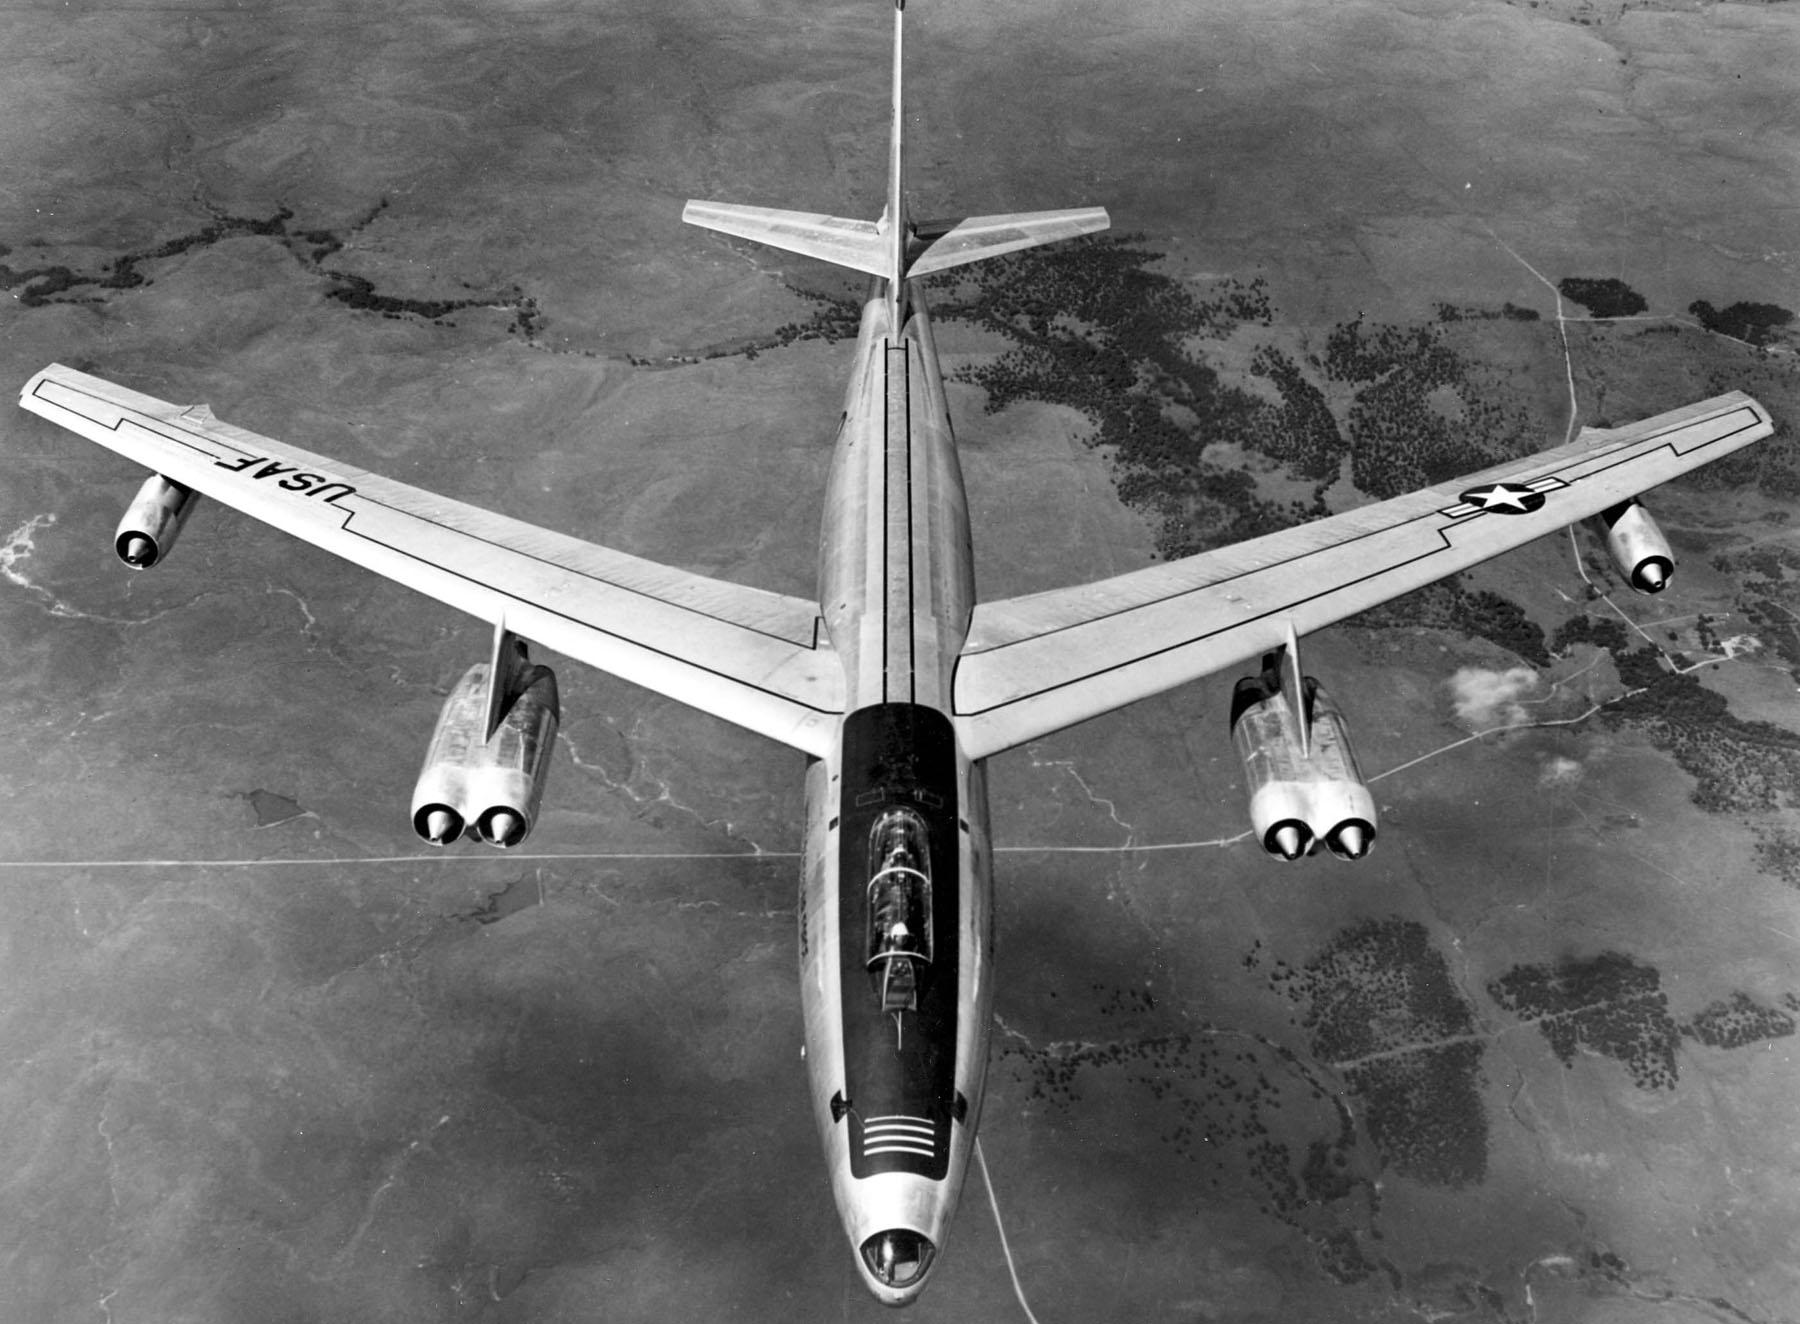 loty rozpoznawcze nad zsrr Boeing RB-47E Stratojet